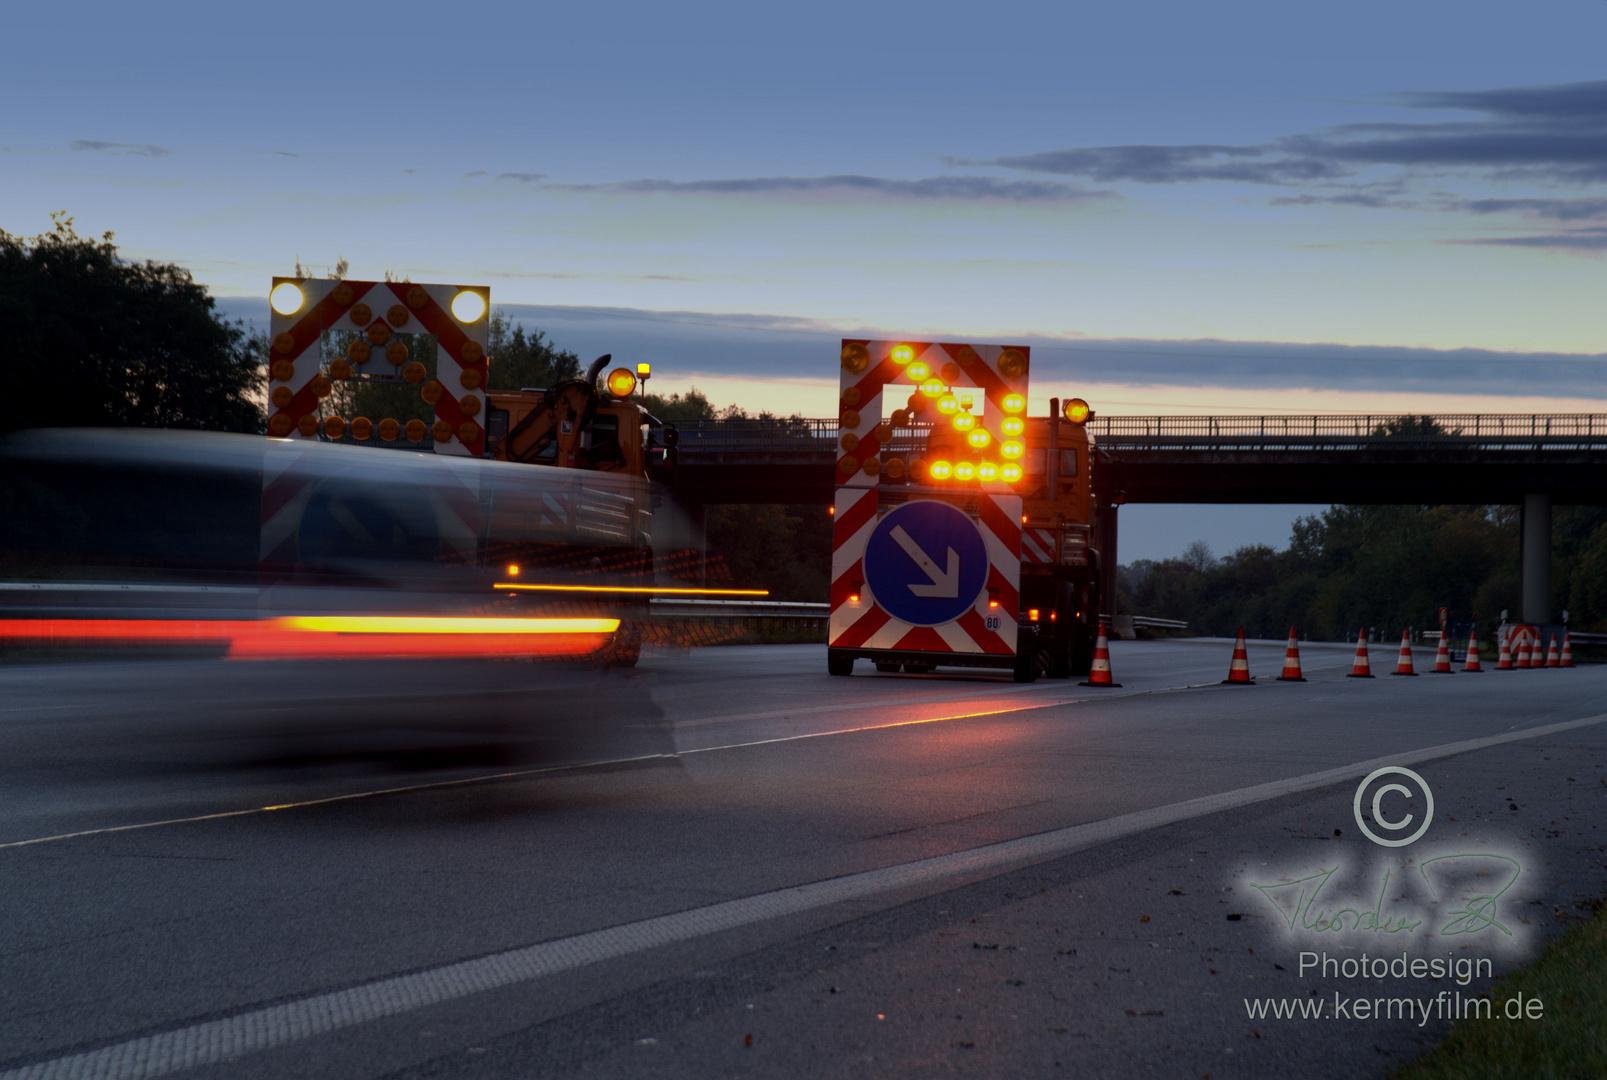 Autobahnsperrung am Morgen